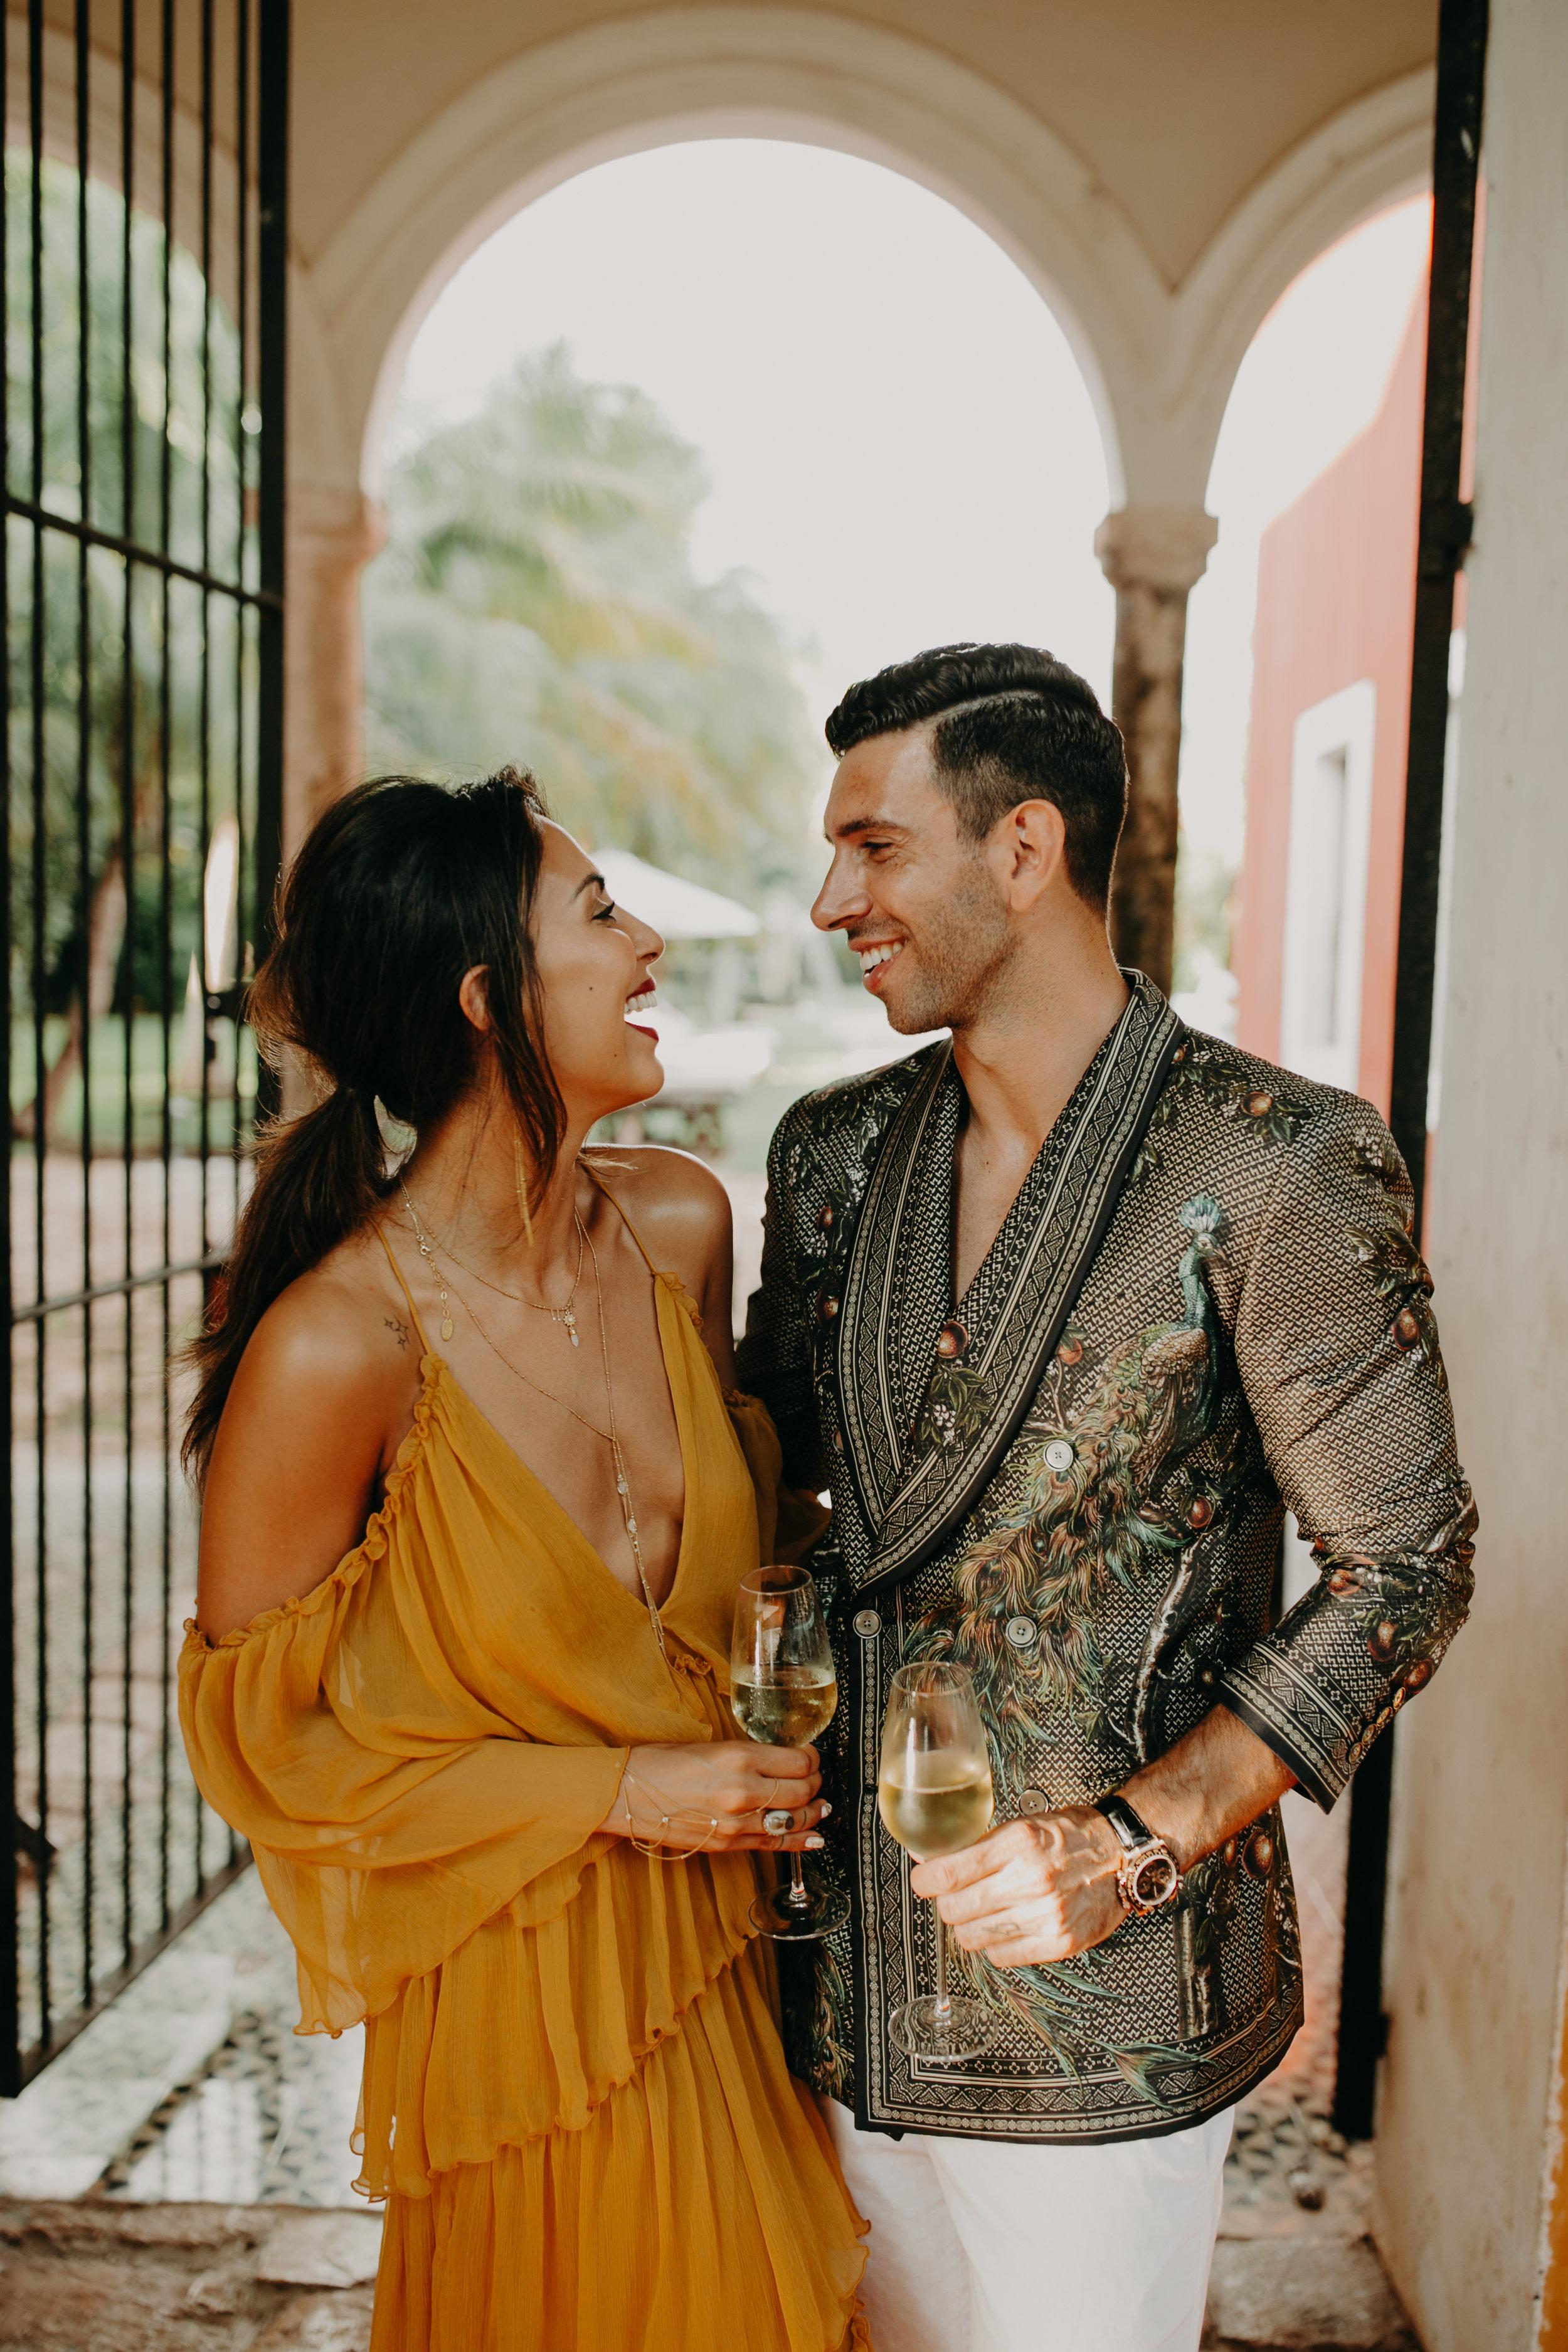 Hacienda Temozon Yucatan Mexico Wedding | Ida & Peter Emily Magers Photography-104.jpg